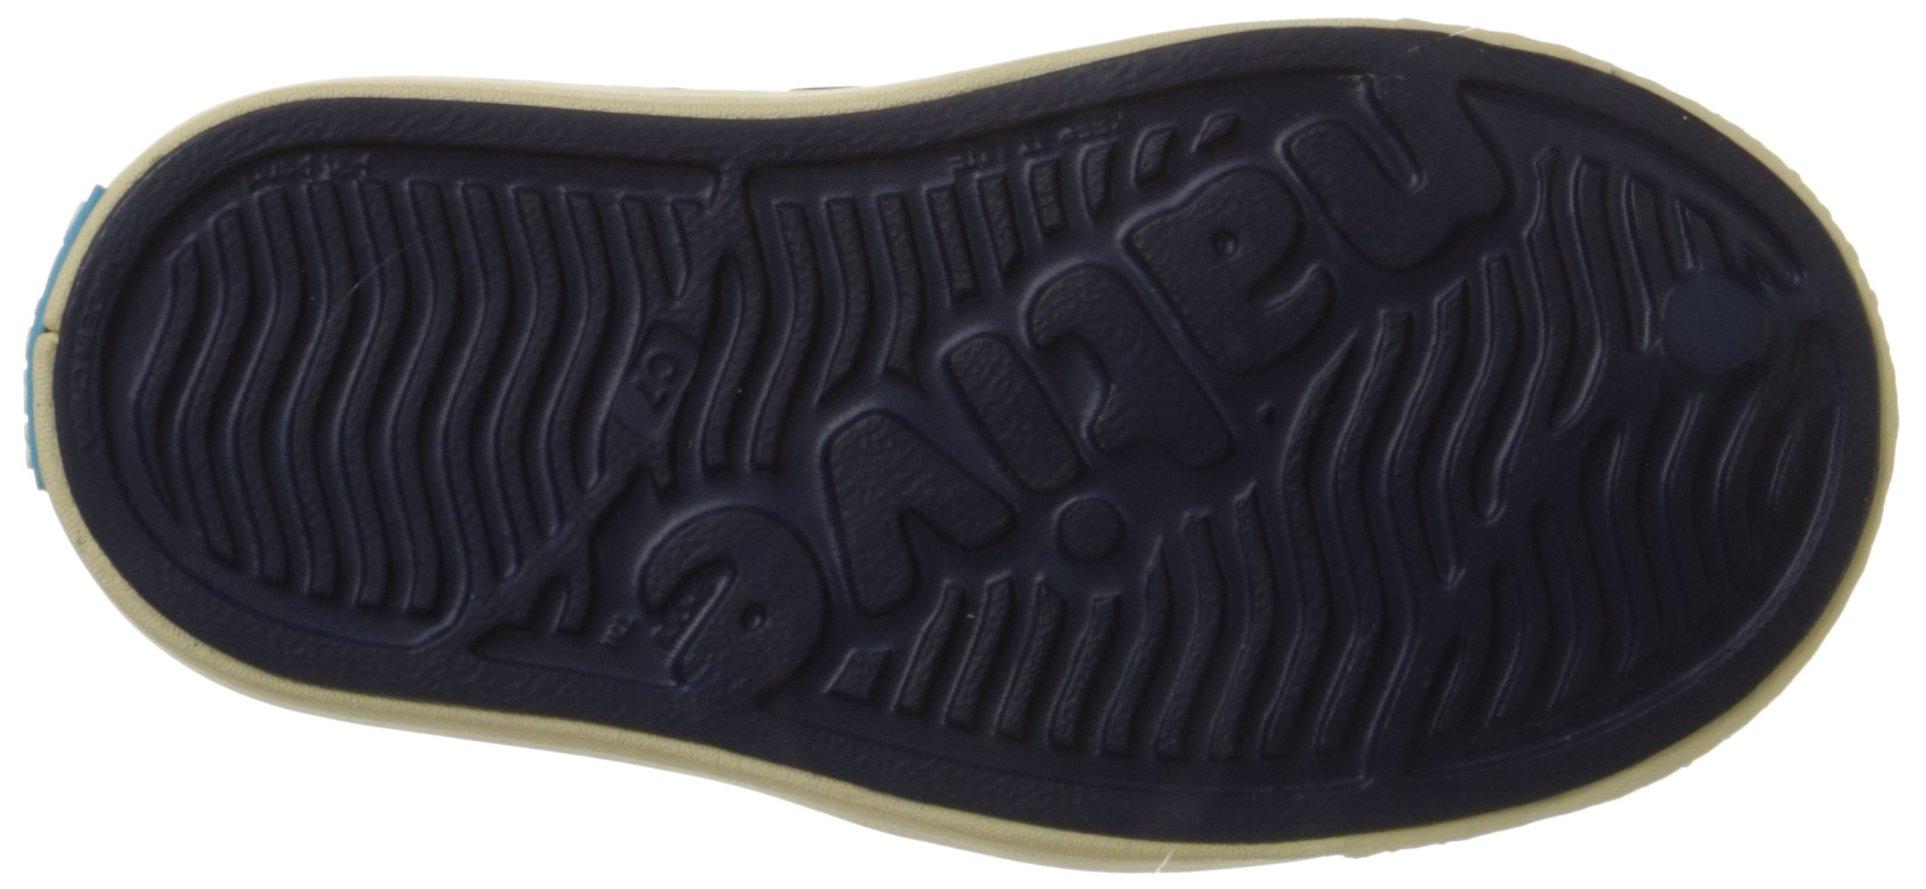 Native Jefferson Slip-On Sneaker,Regatta Blue,10 M US Toddler by Native Shoes (Image #3)